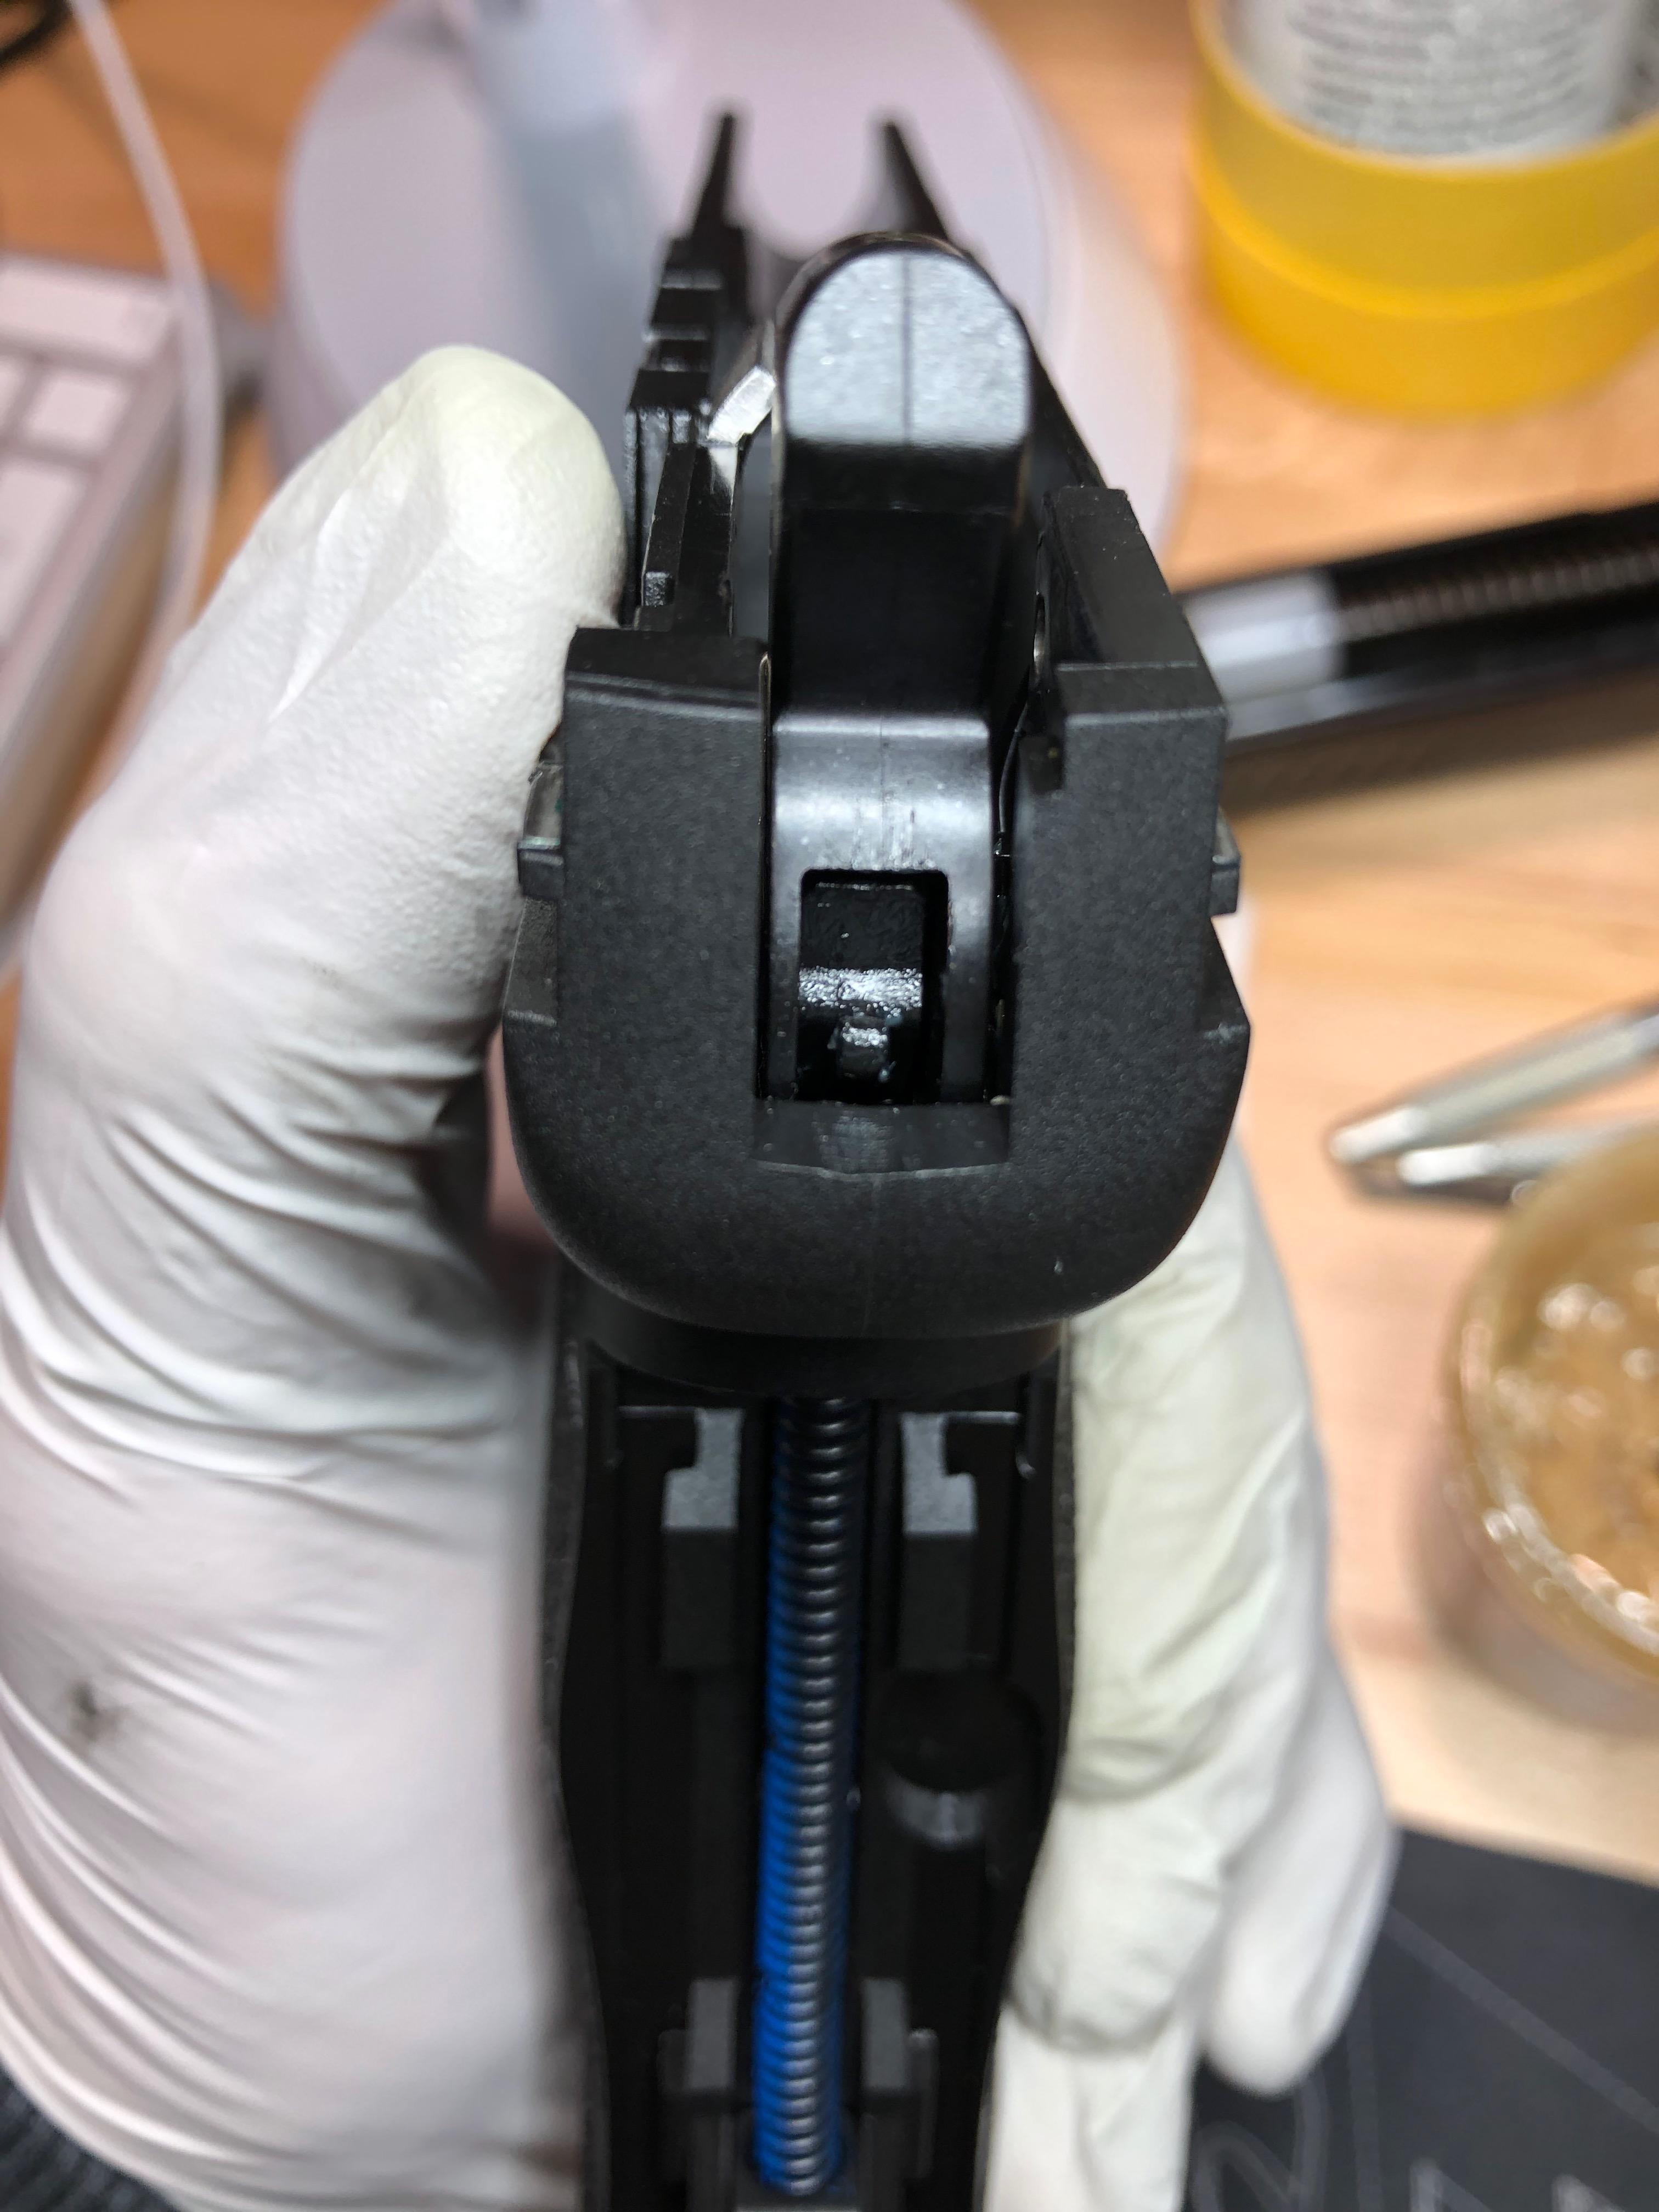 HK45 New LEM Install w/ Grayguns Short Reset Package - Doesn't Function-img_4057.jpg